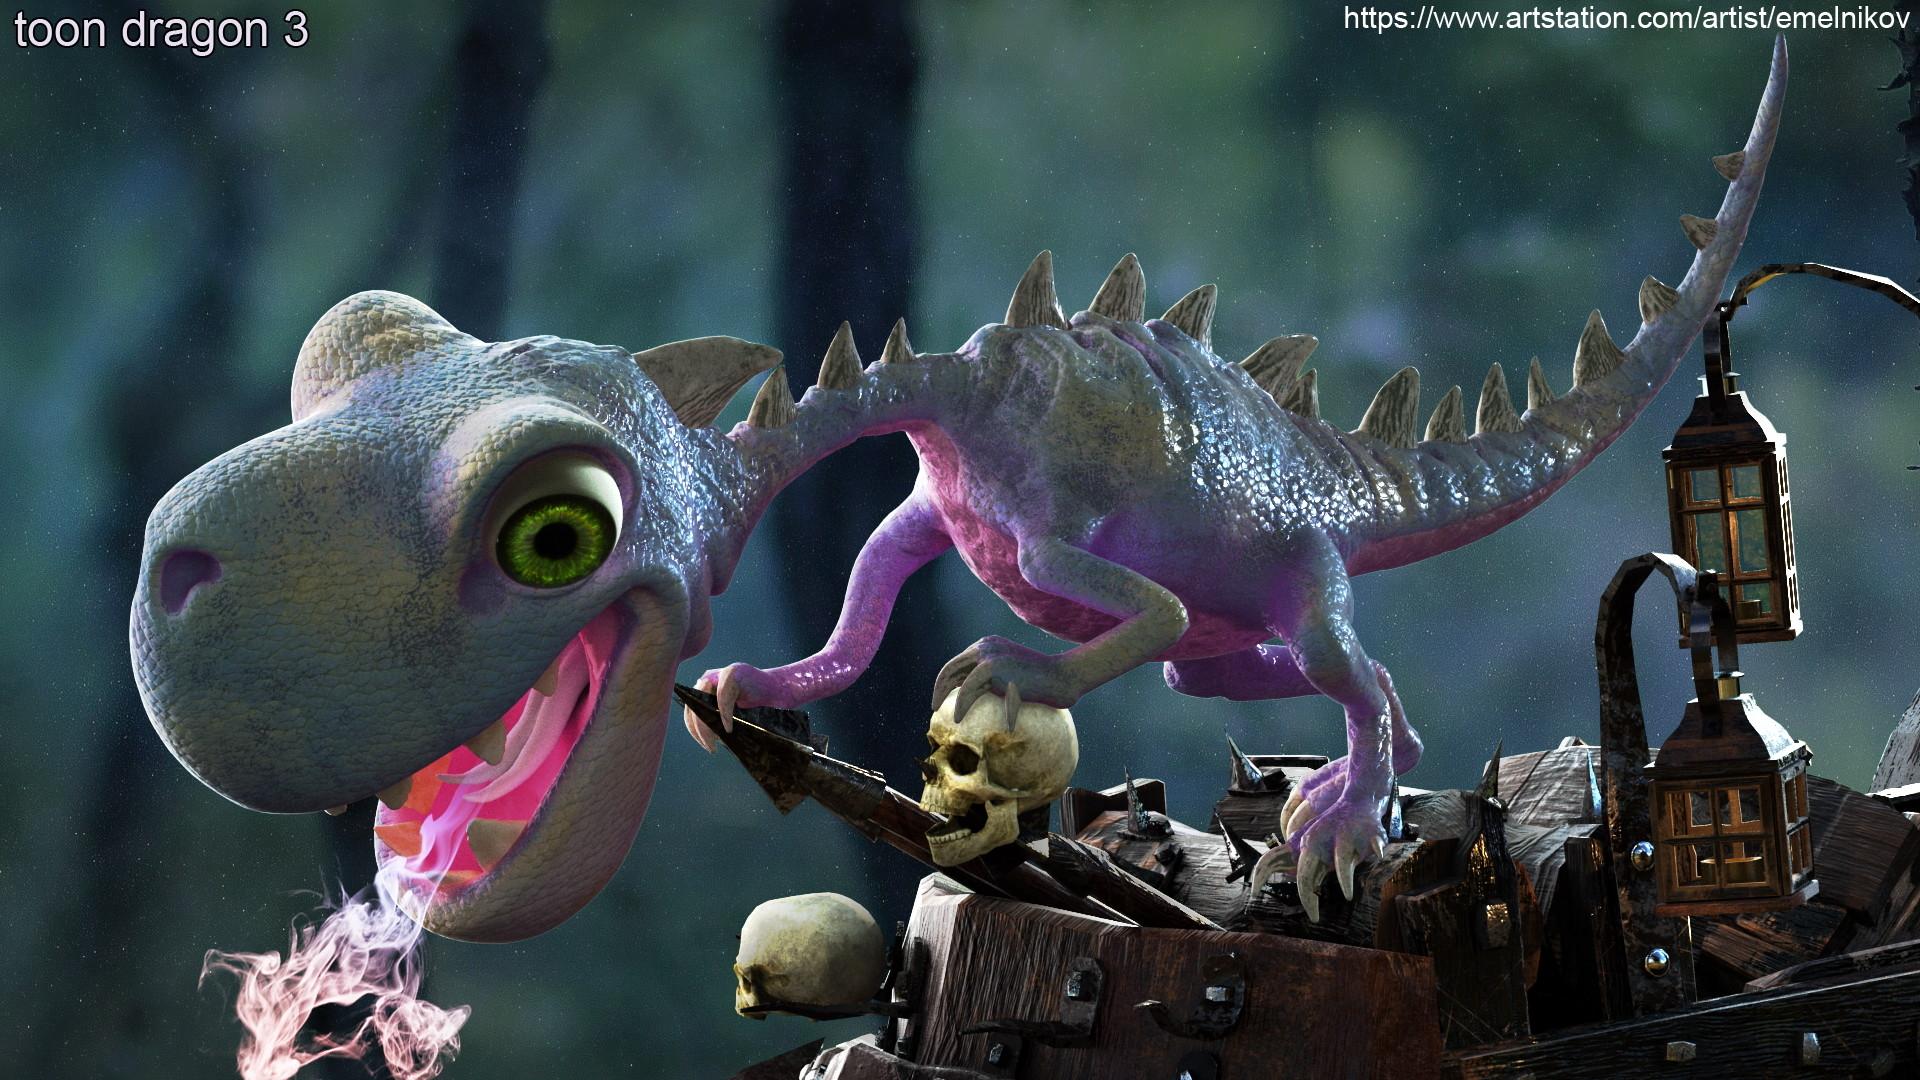 Eugene melnikov toon dragon 3 1 c